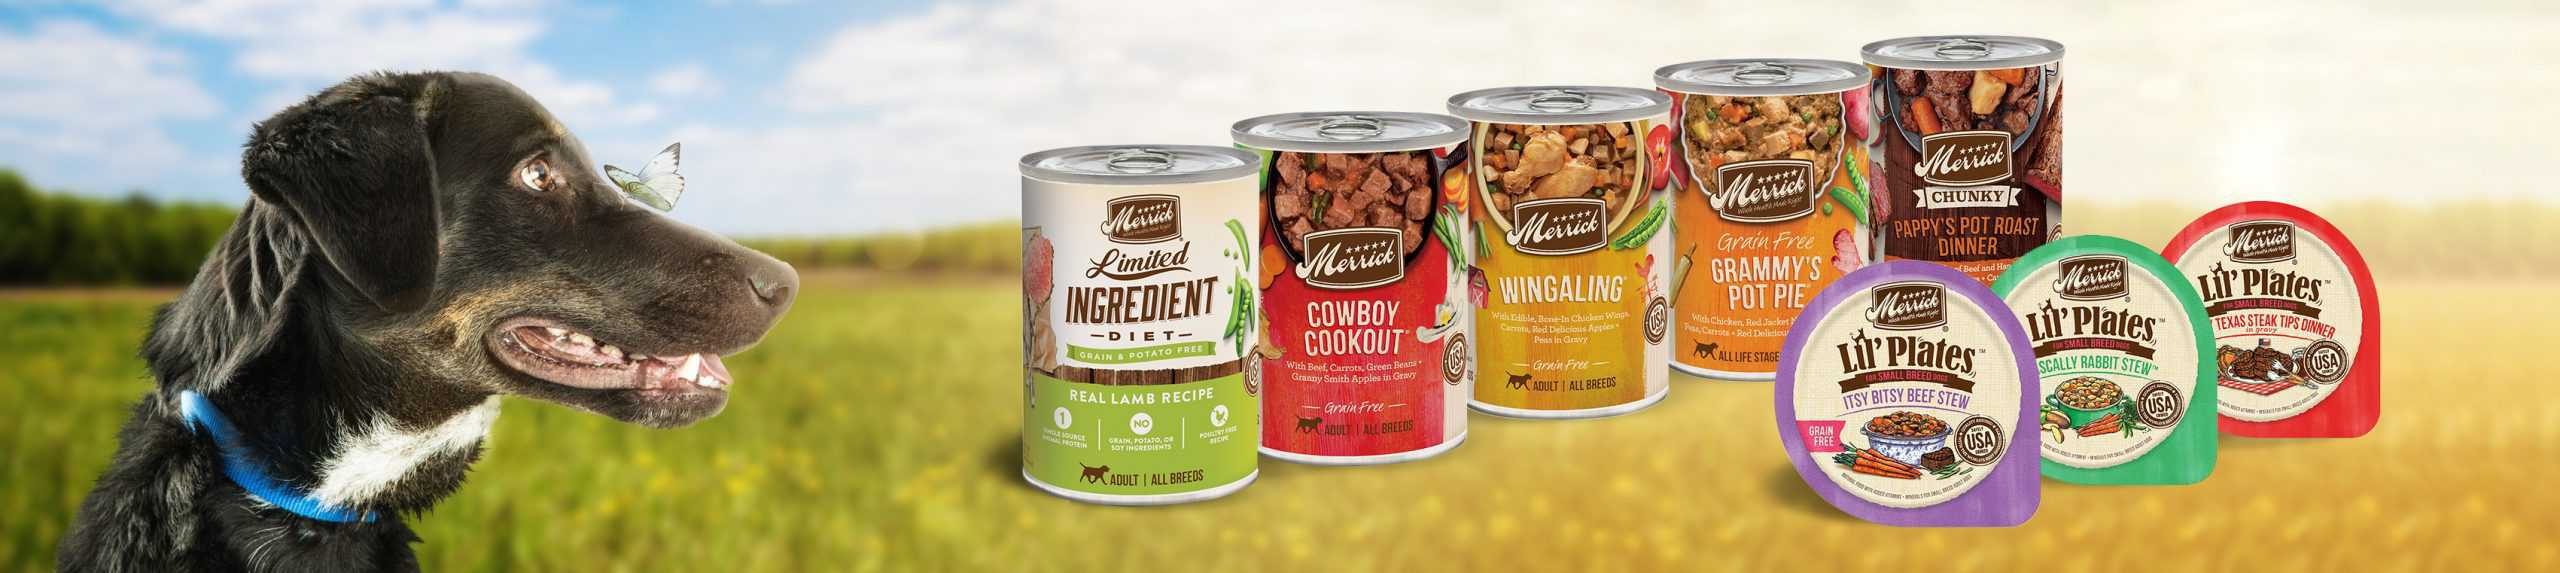 Merrick Dog Food: 2021 Review, Recalls & Coupons 8